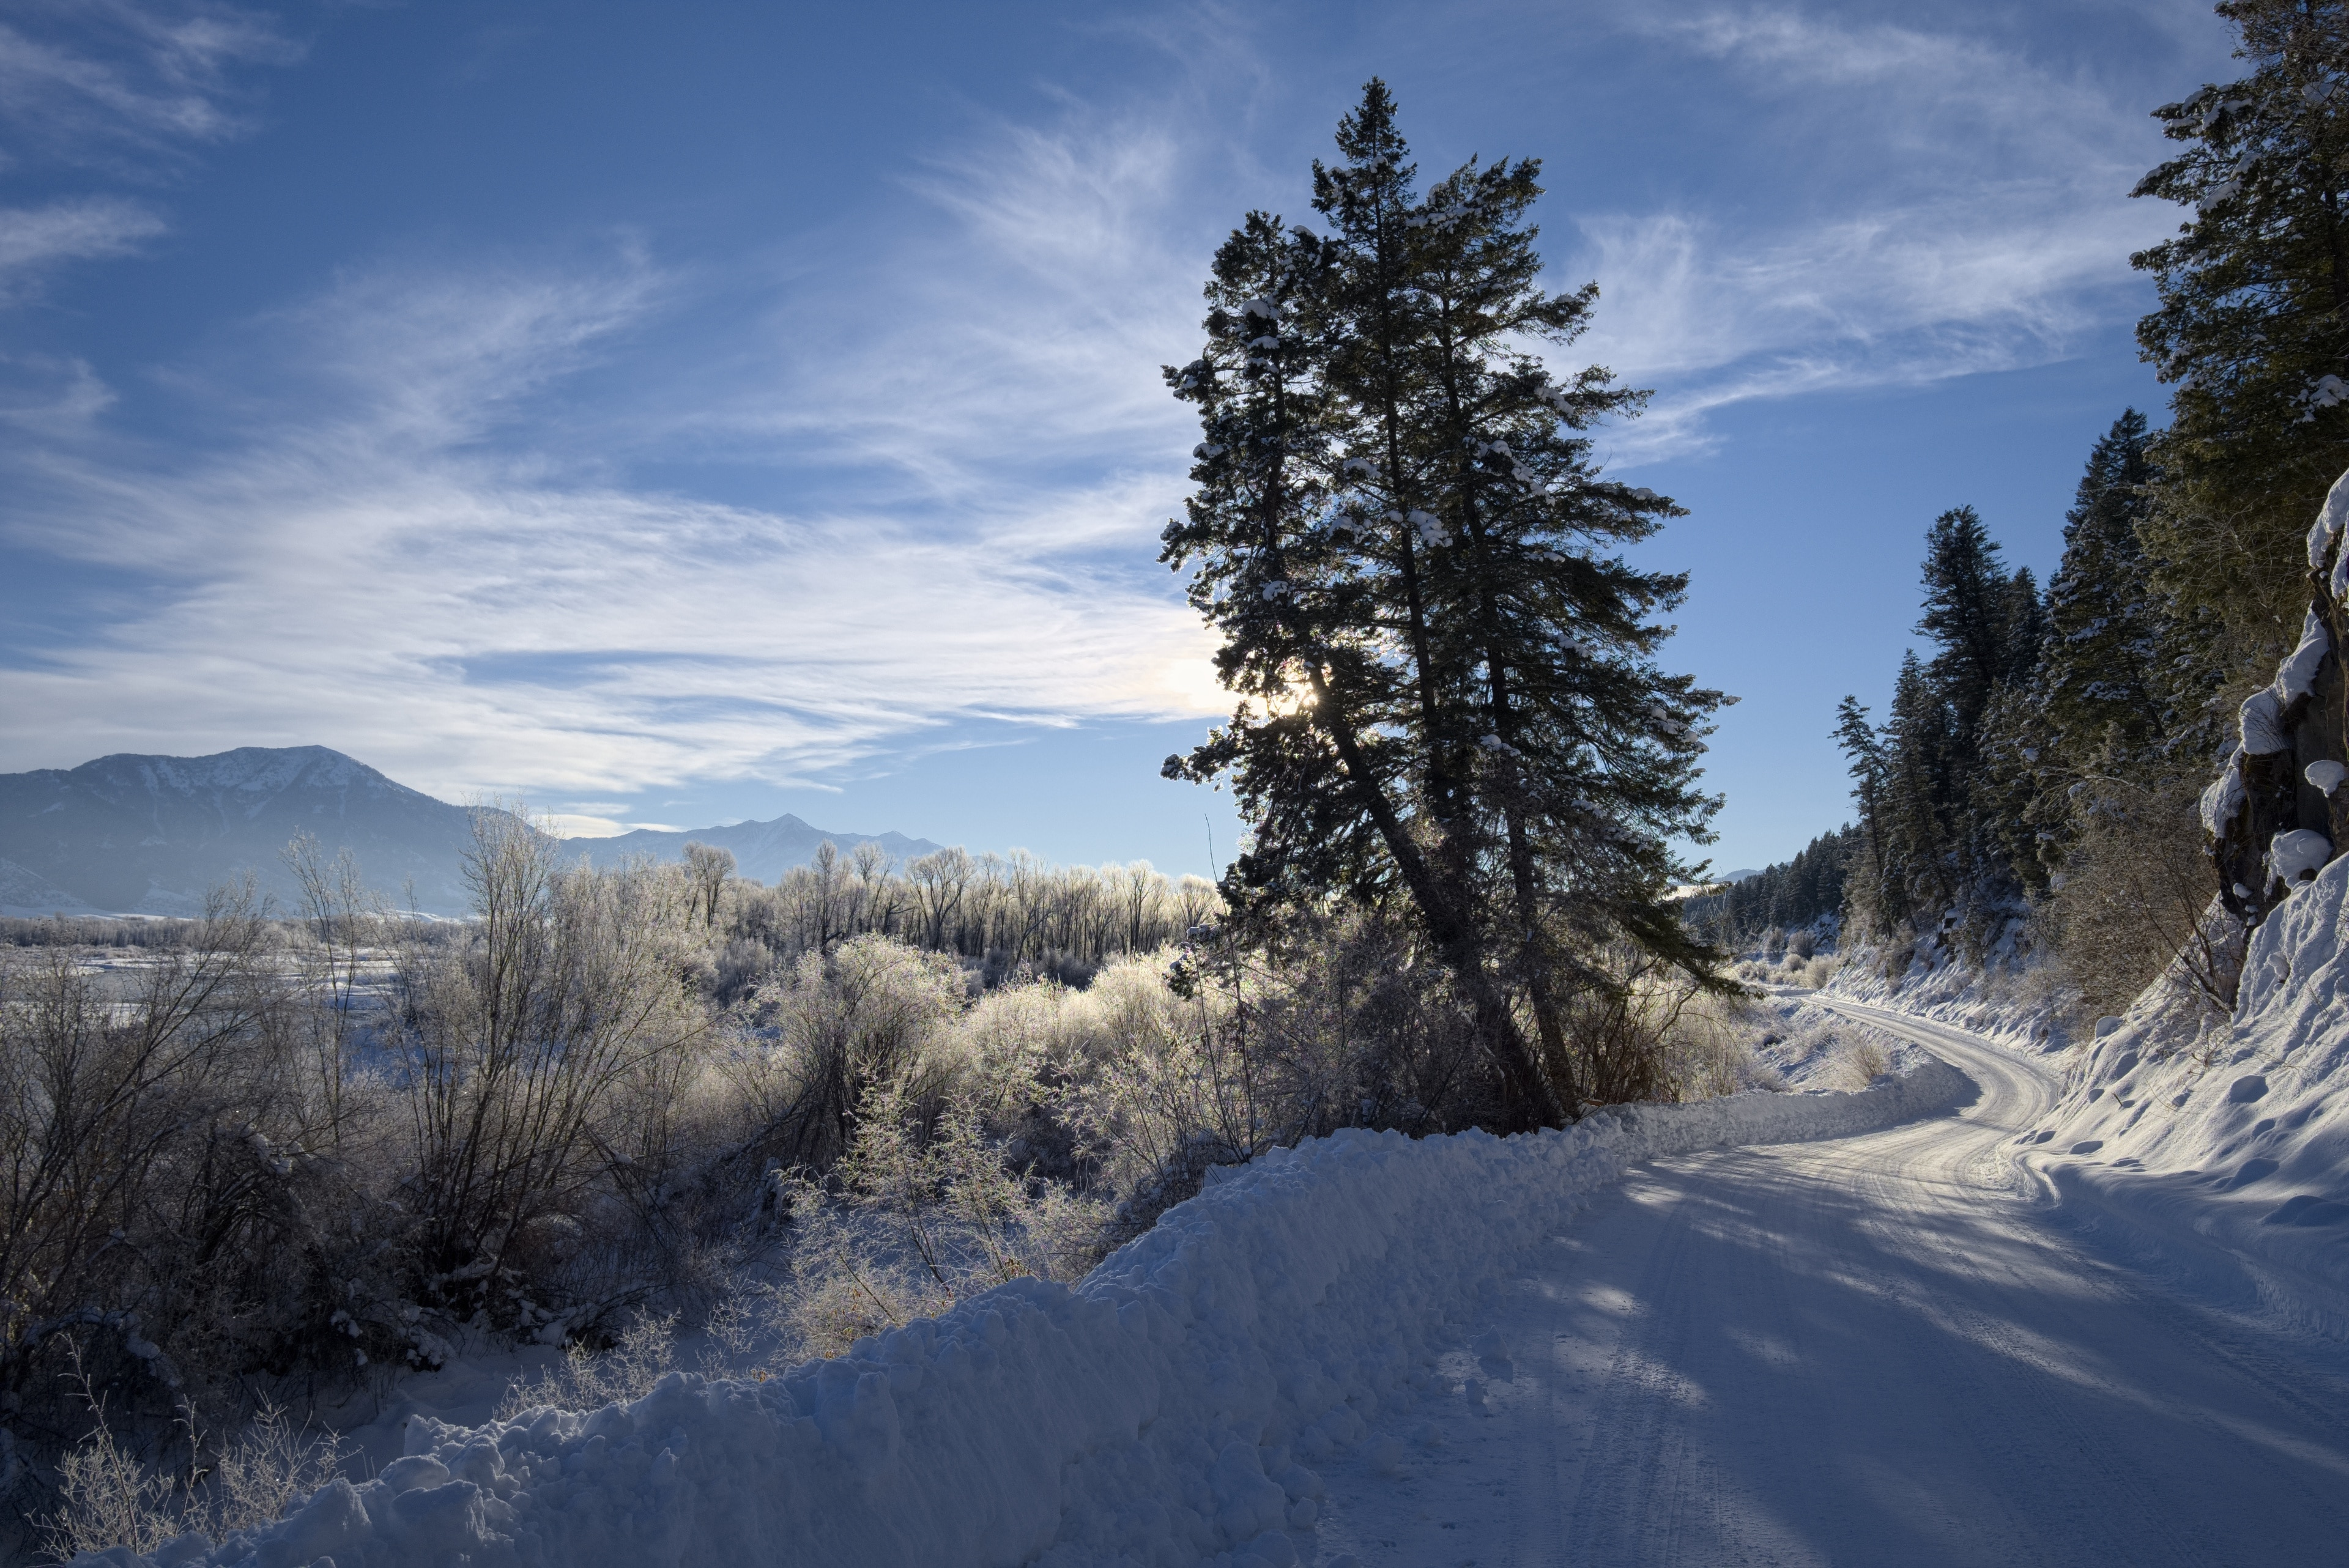 Swan Valley, Idaho, United States of America